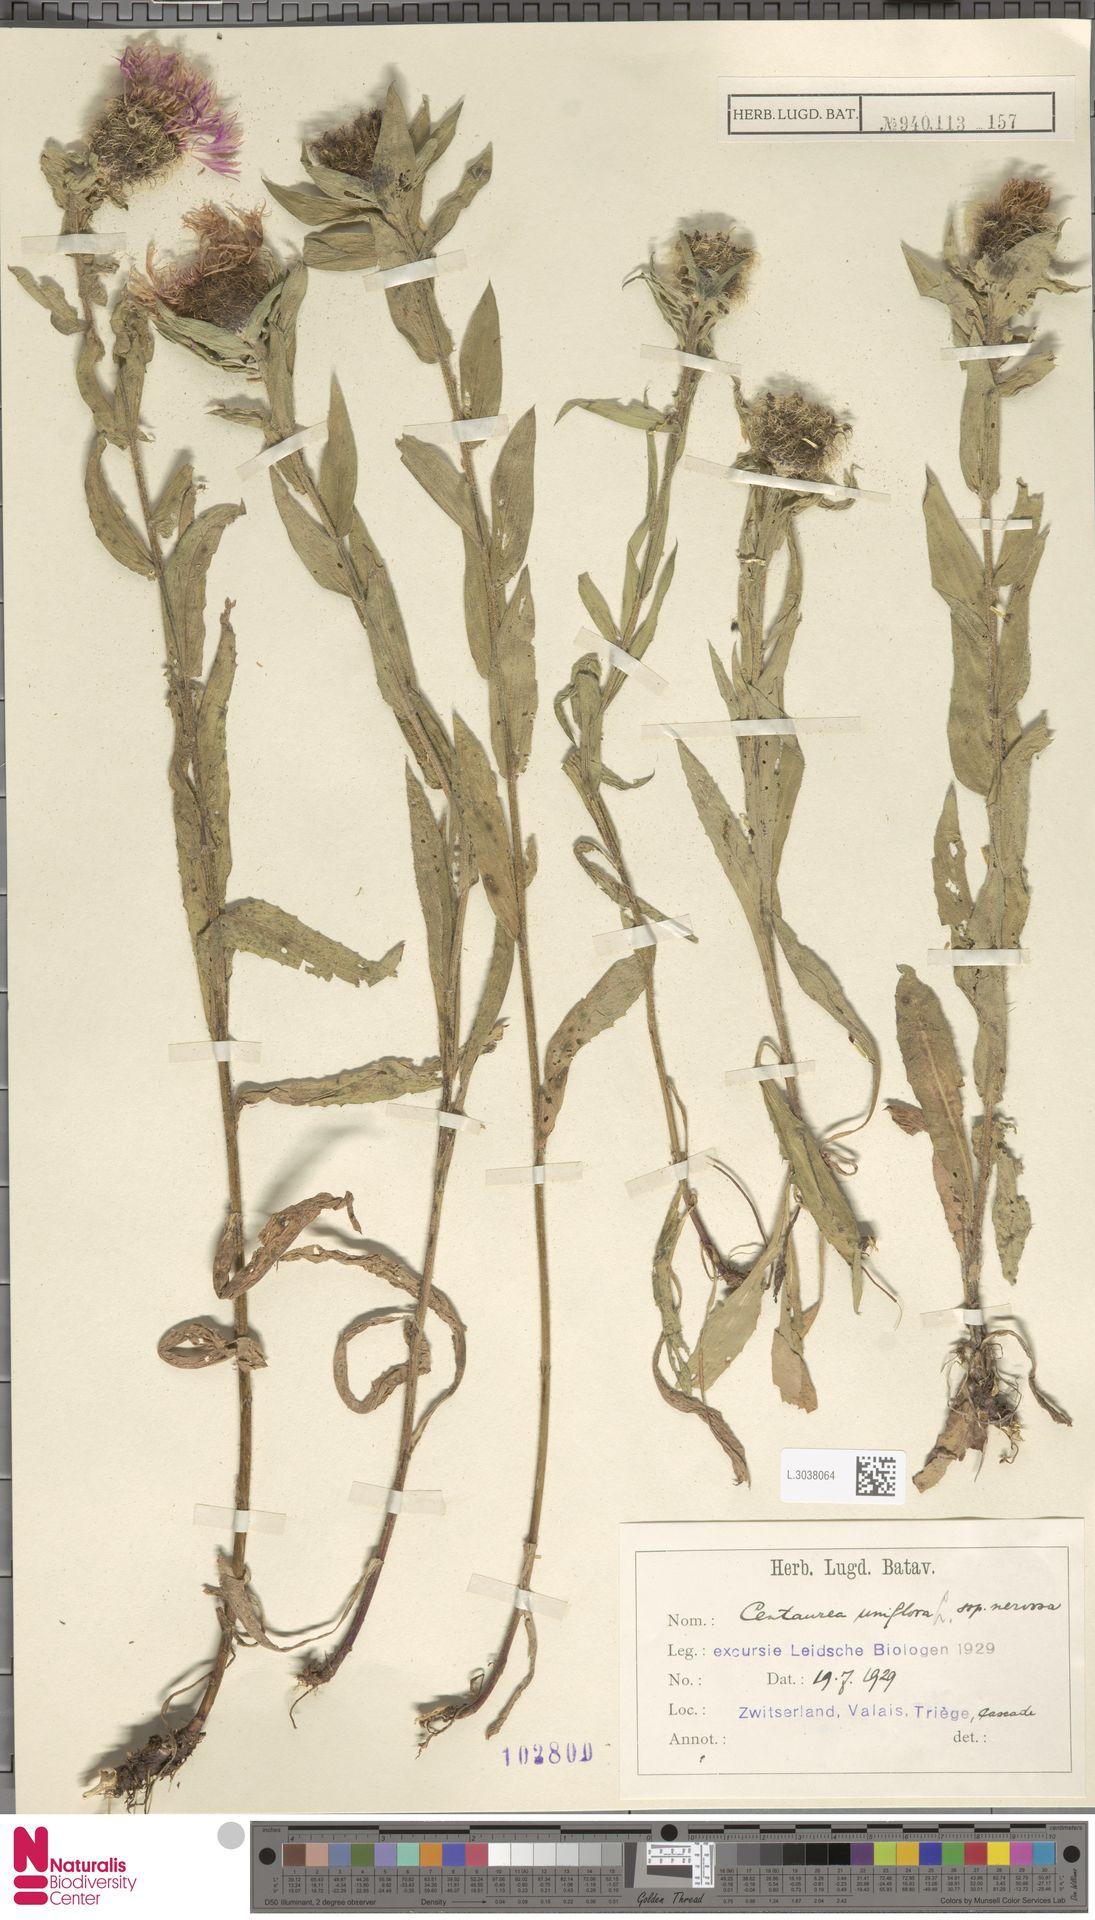 L.3038064 | Centaurea uniflora subsp. nervosa (Willd.) Bonnier & Layens